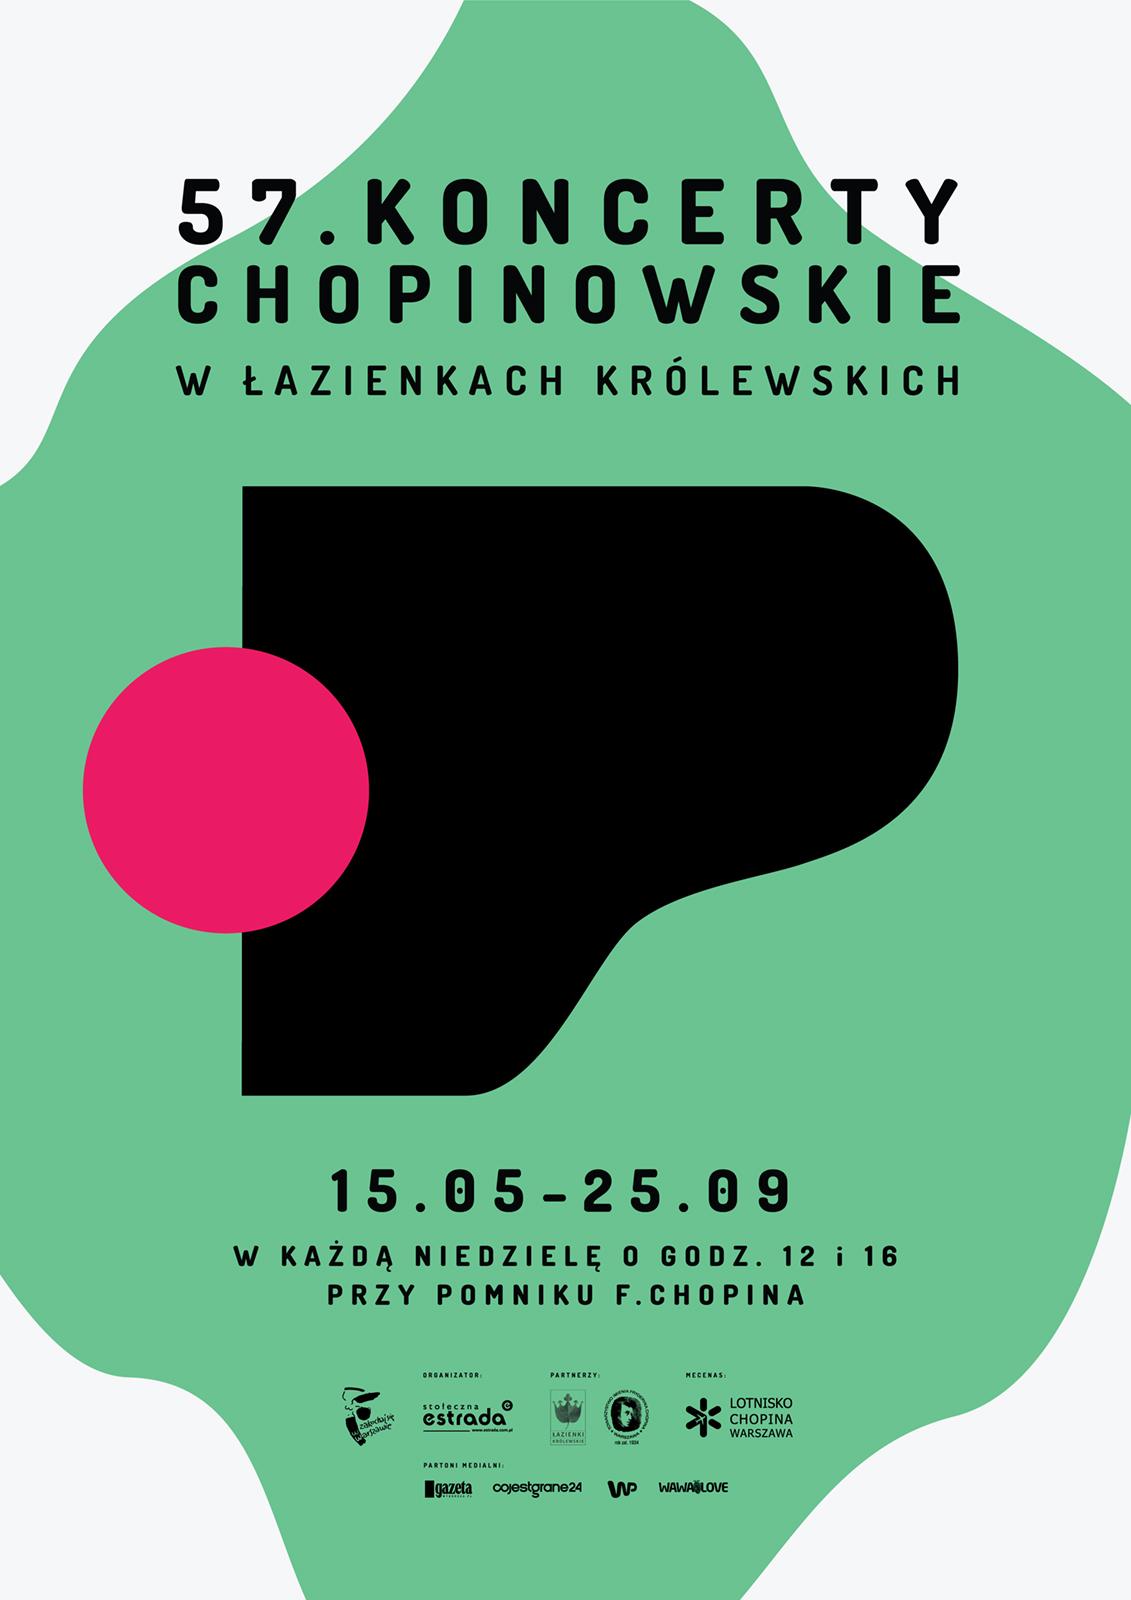 kohe-koncerty chopinowskie-plakat